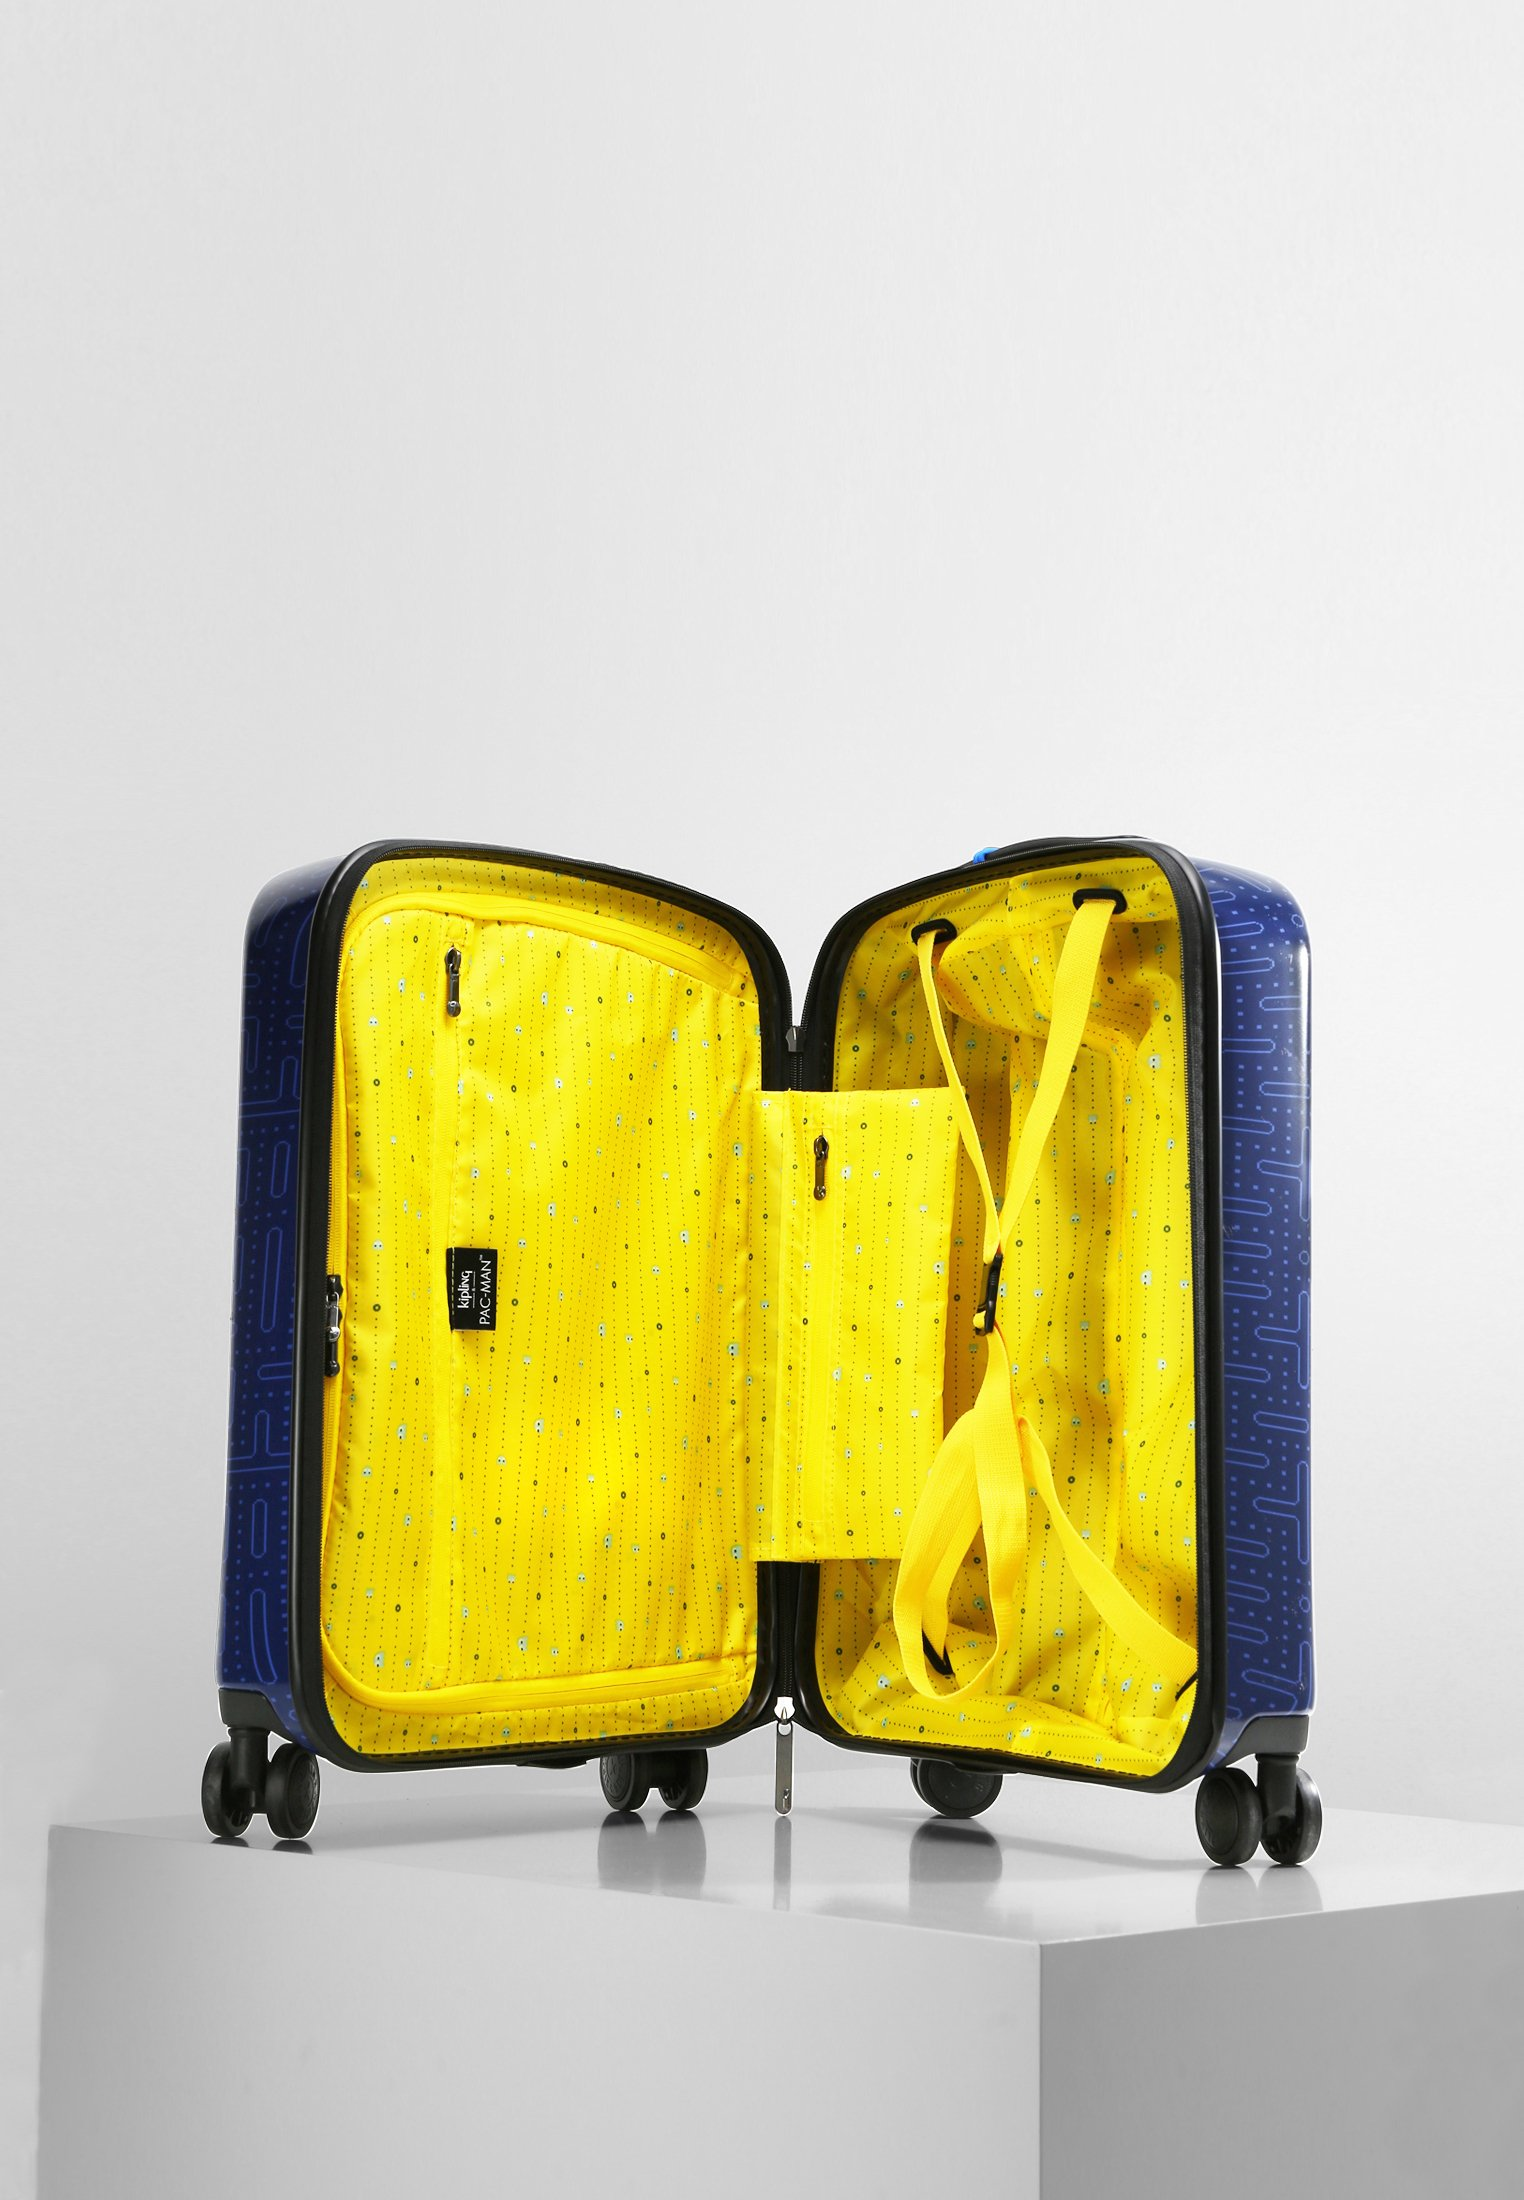 Kipling CURIOSITY S PACM - Trolley - pac man good - Borse & Accessori da donna Genuino